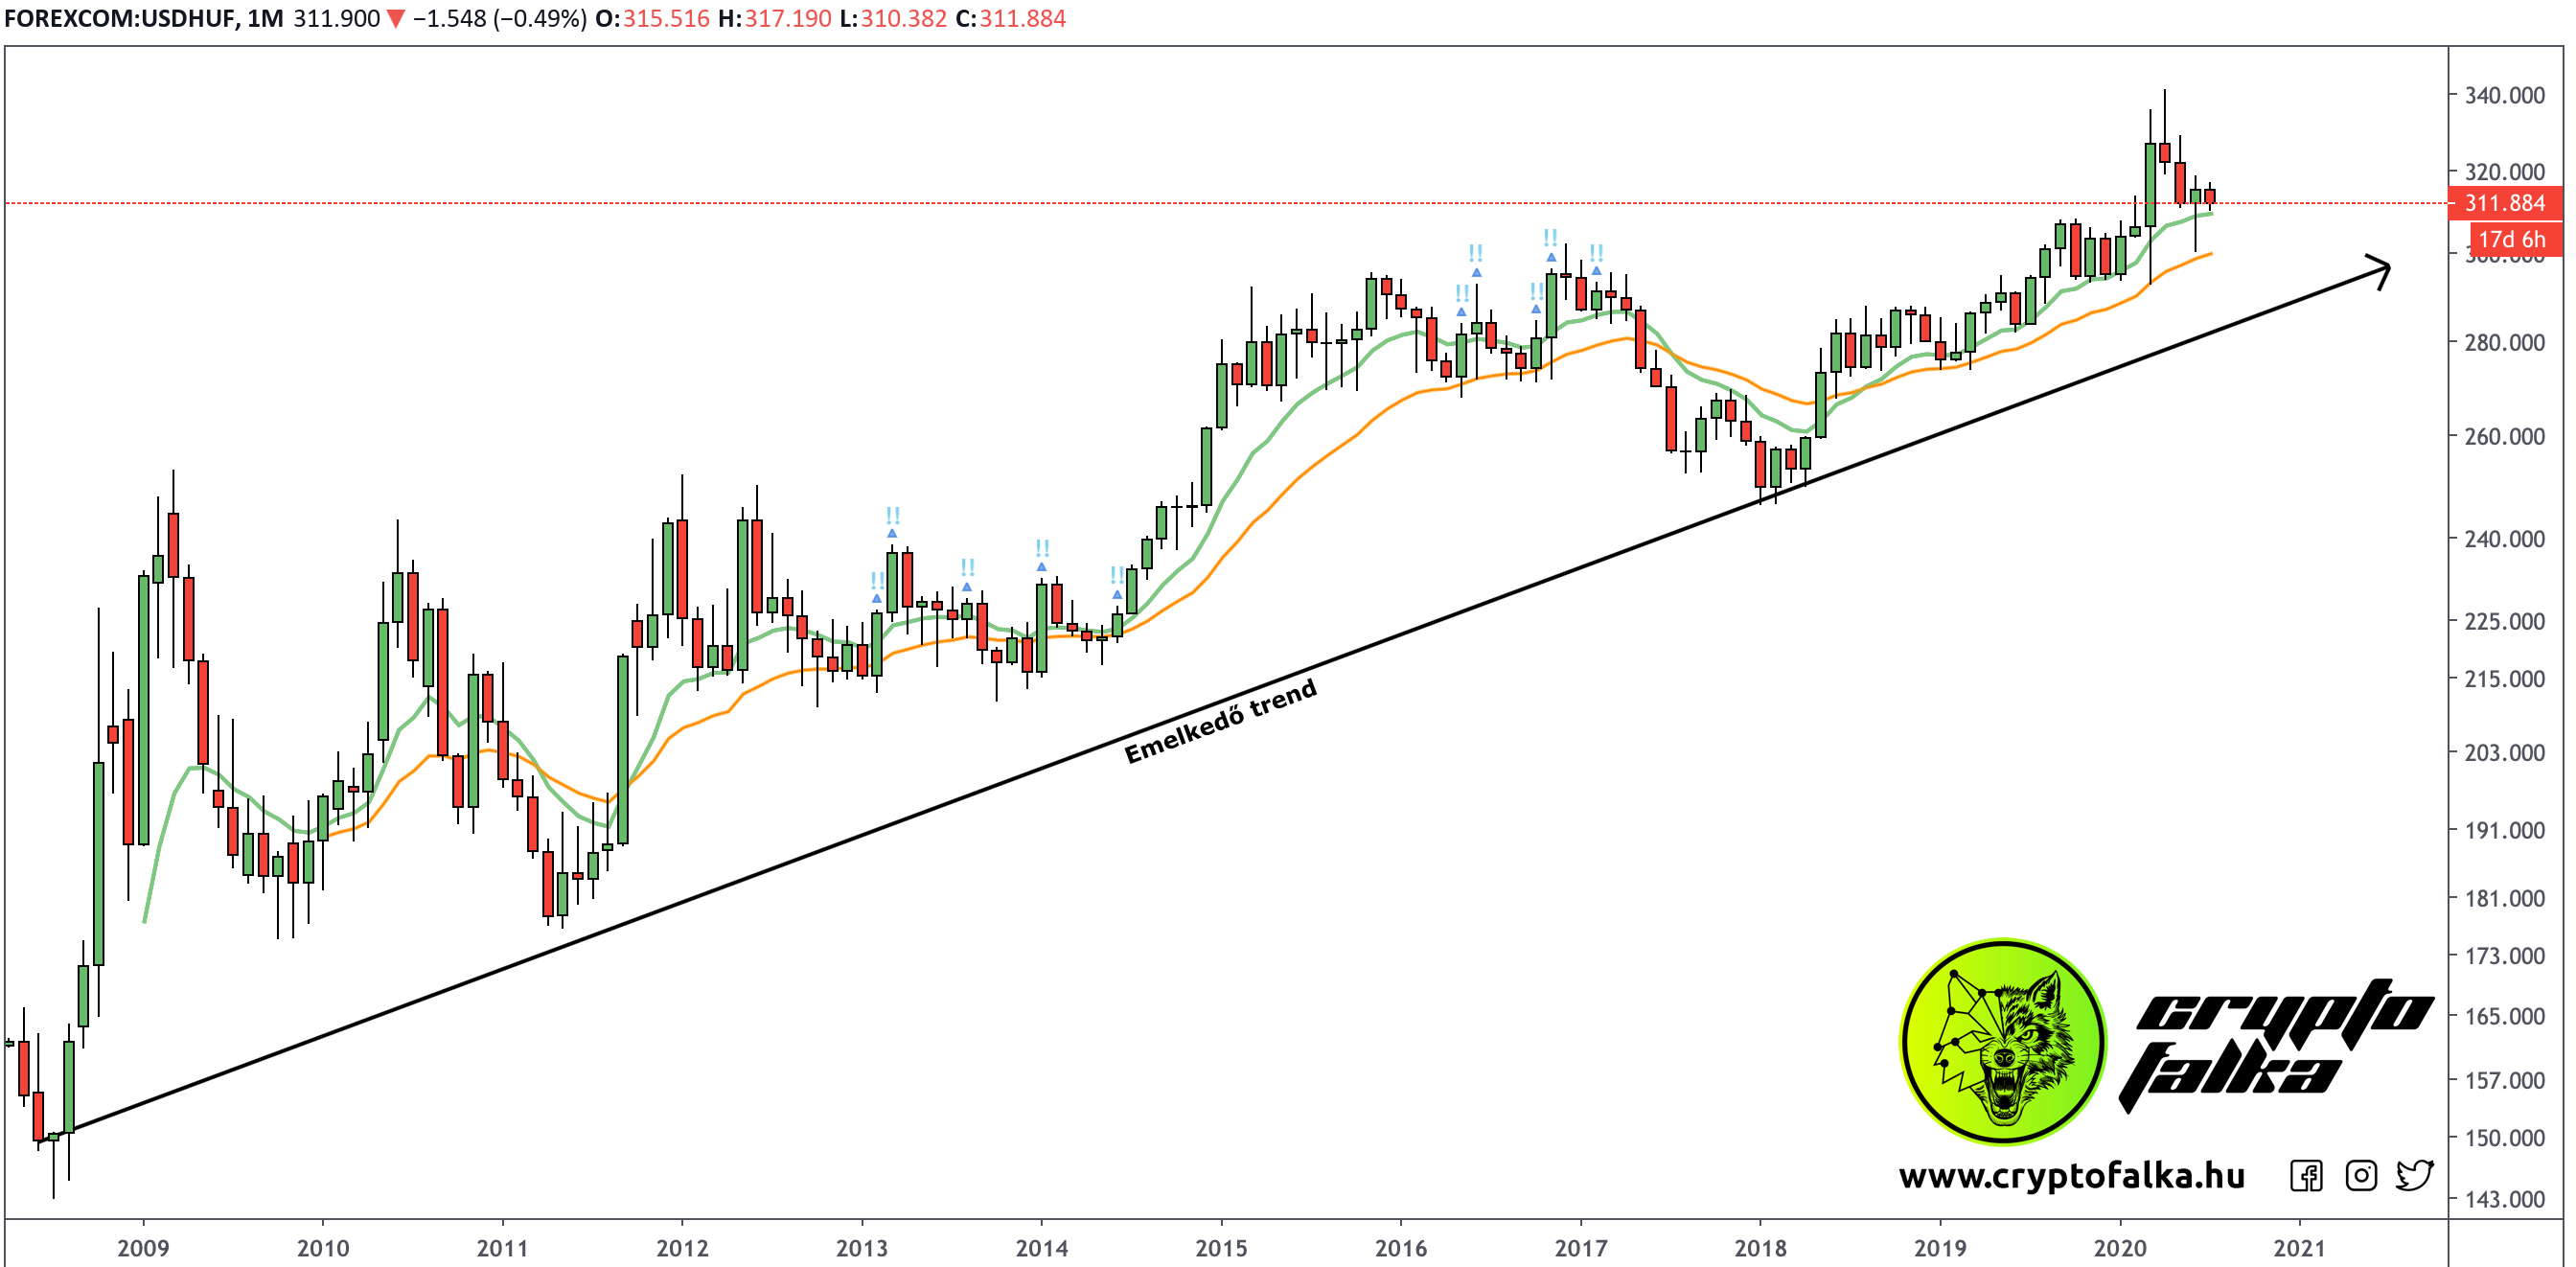 USD/HUF felfelé emelkedő trend havi nézeten.